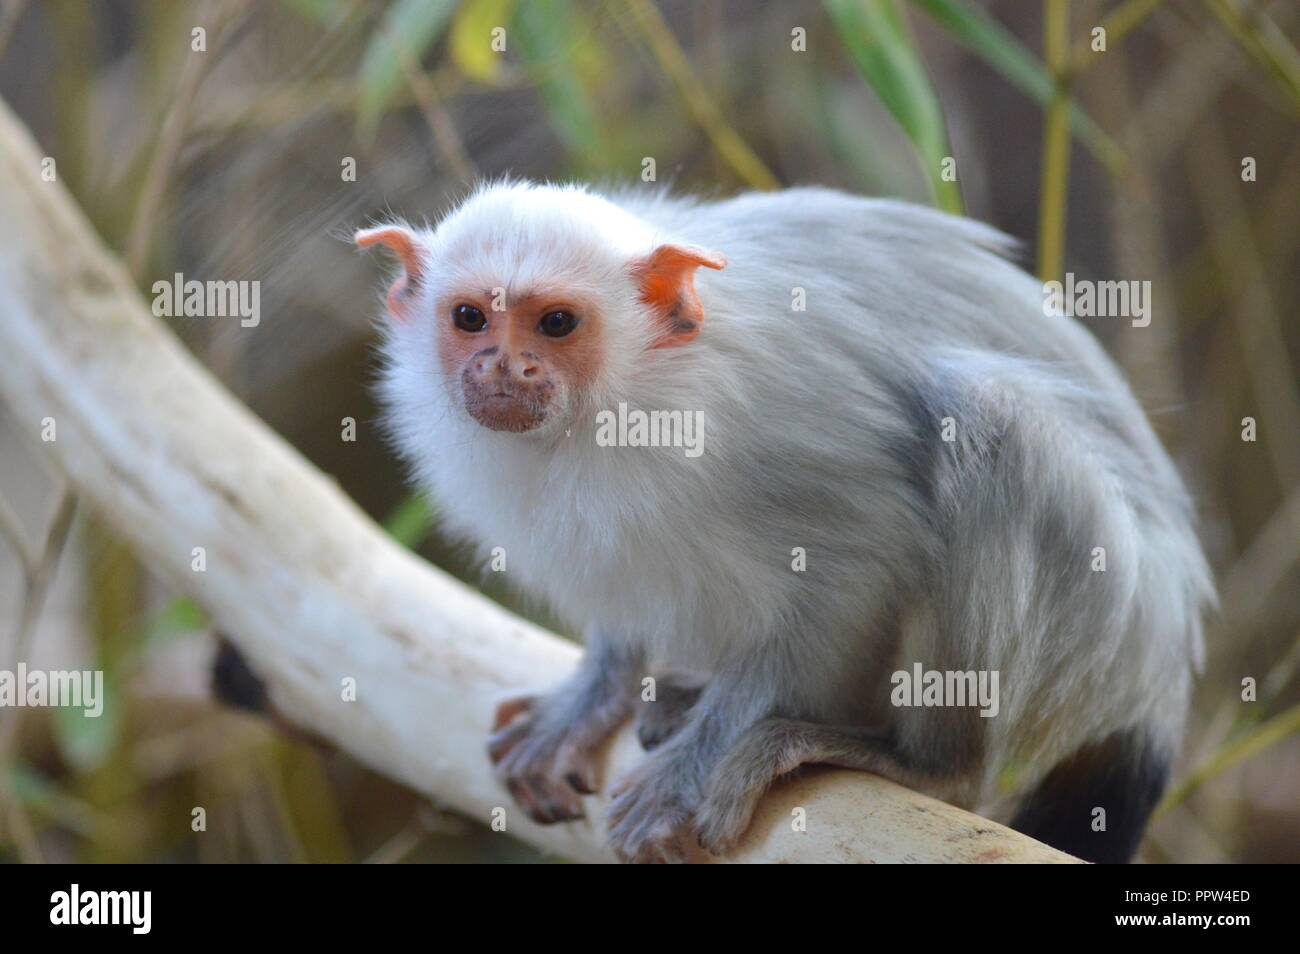 Silvery marmoset portrait - Stock Image